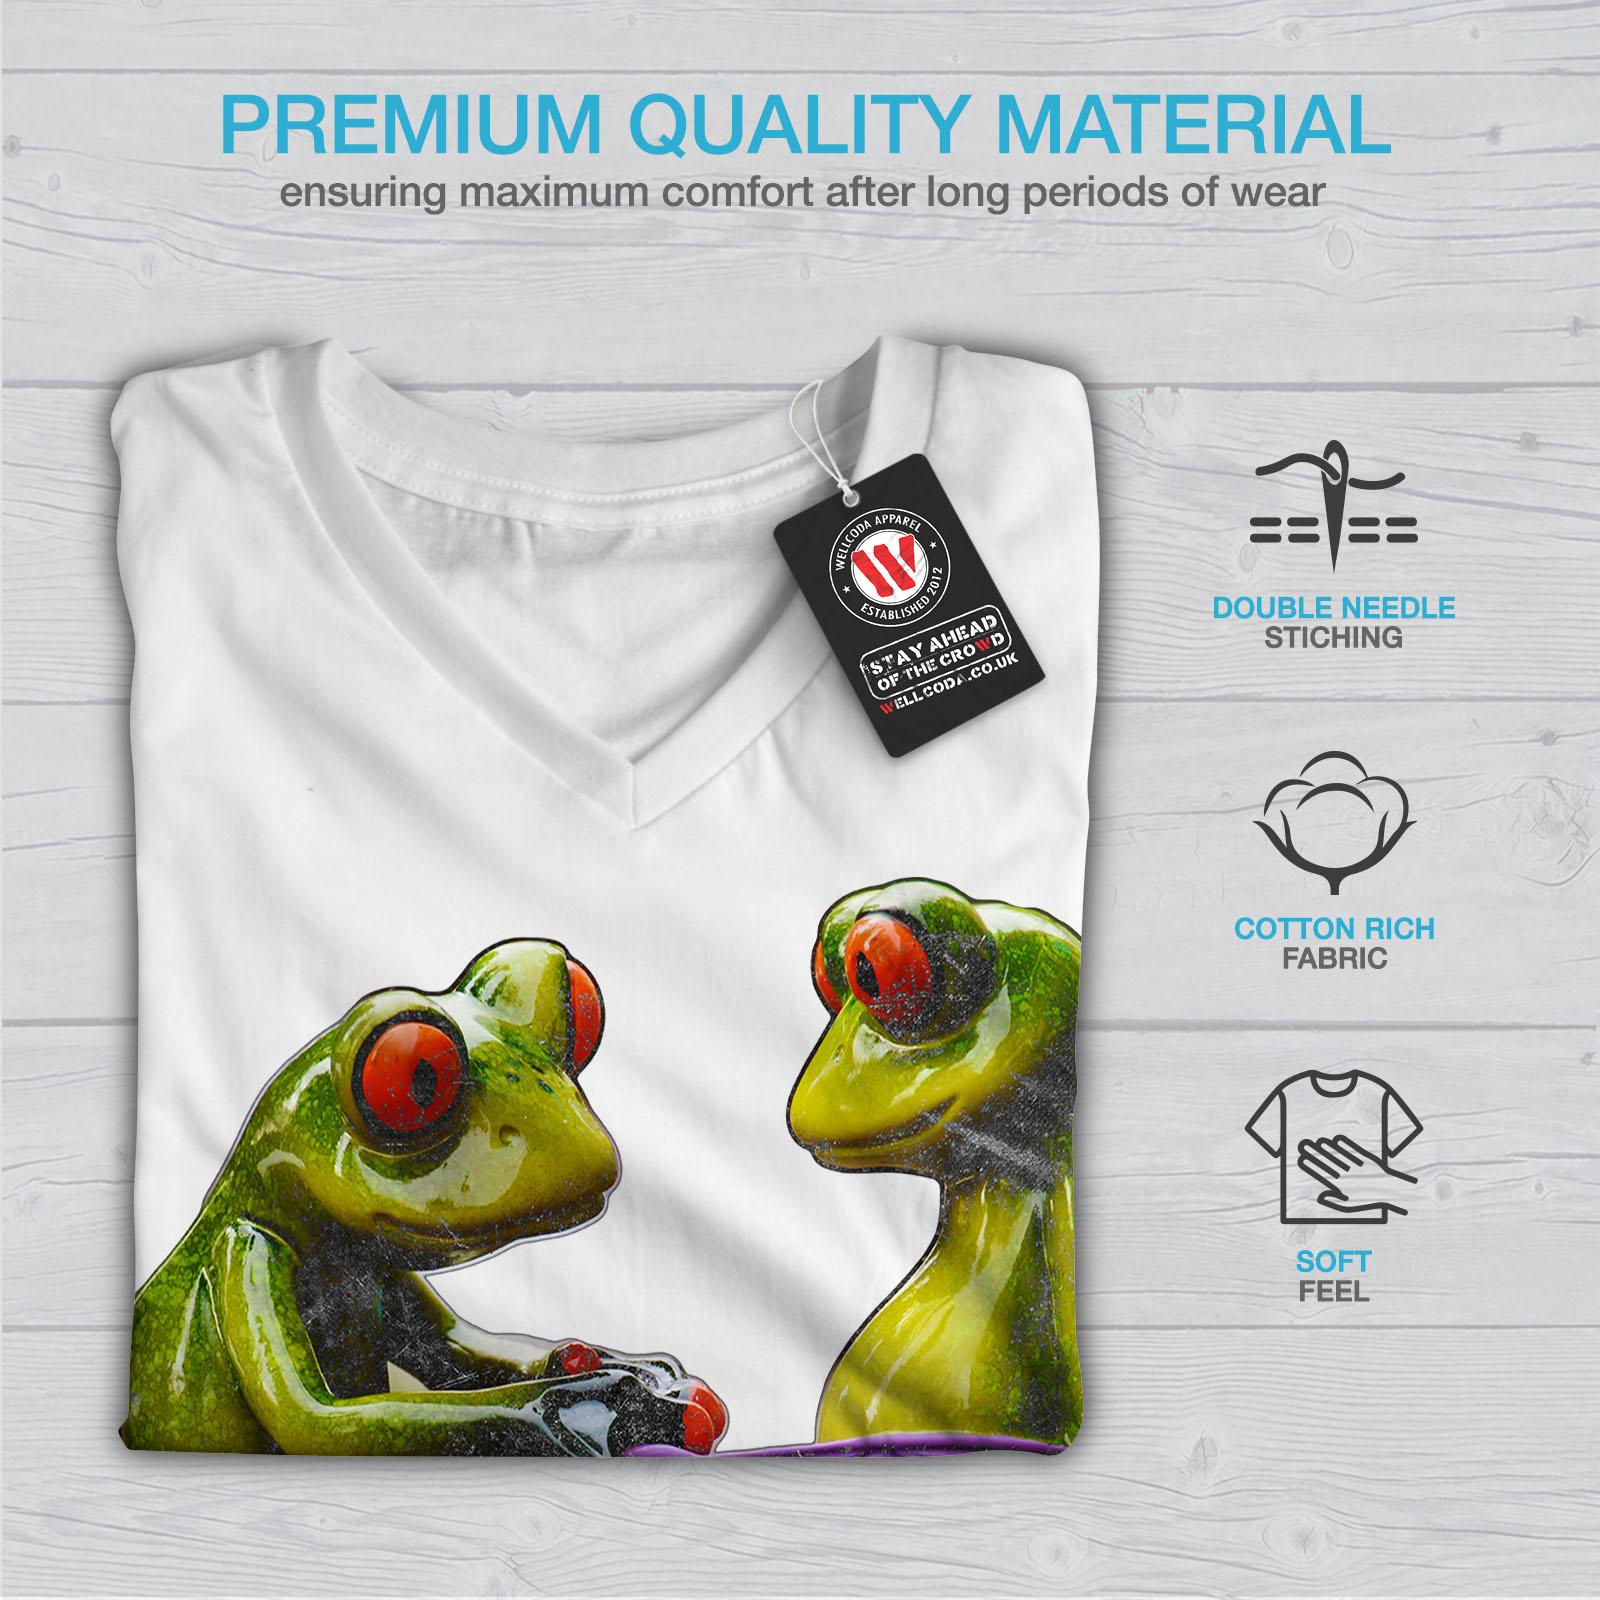 Wellcoda-RANE-Cool-scherzo-da-Donna-V-Neck-T-shirt-Biancheria-Intima-Design-Grafico-Tee miniatura 9